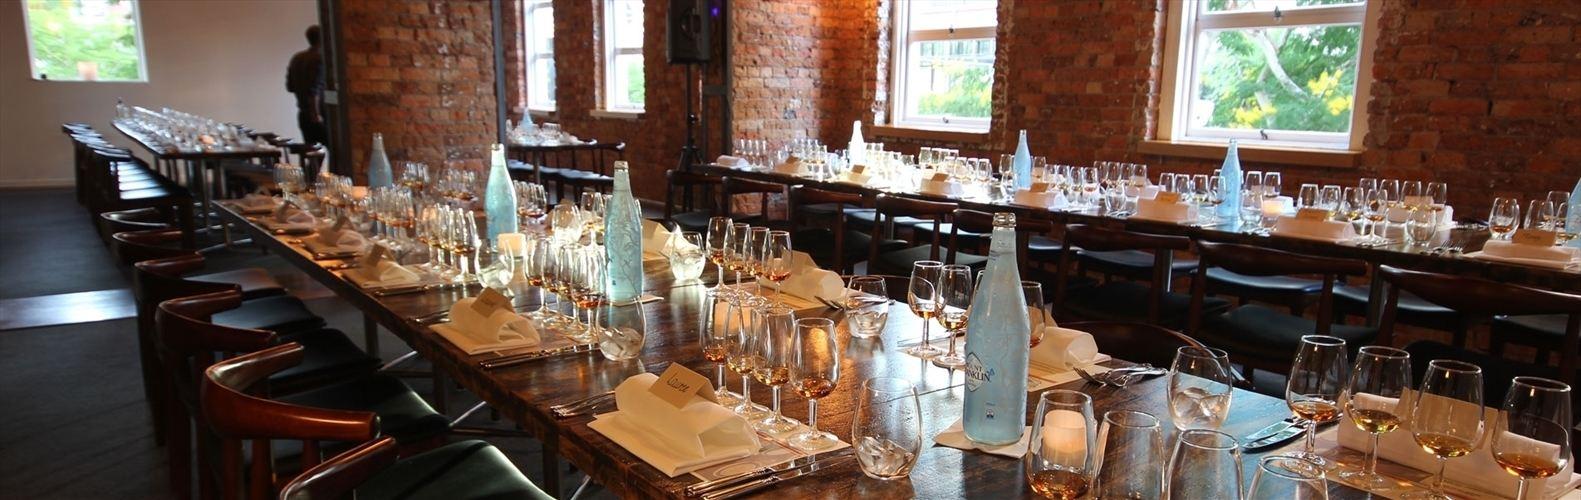 Wedding Venue - Malt Dining - Whole Venue 3 on Veilability